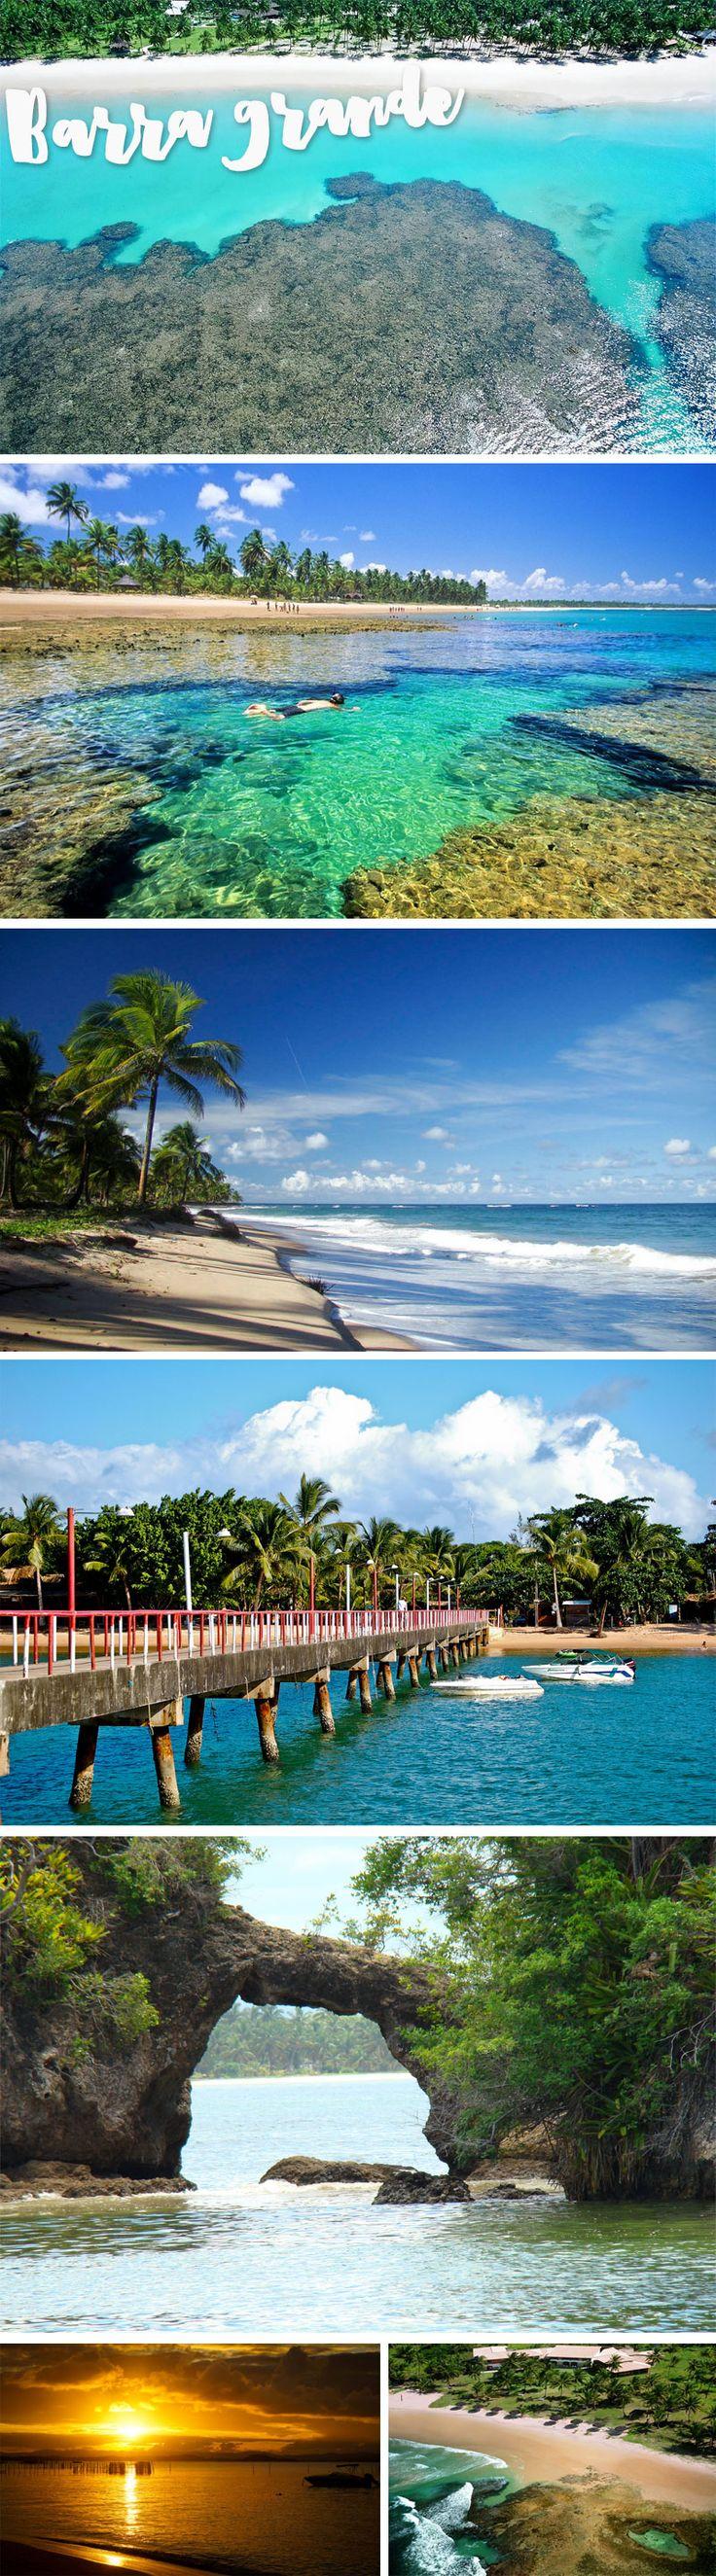 praias da bahia barra grande taipus de fora